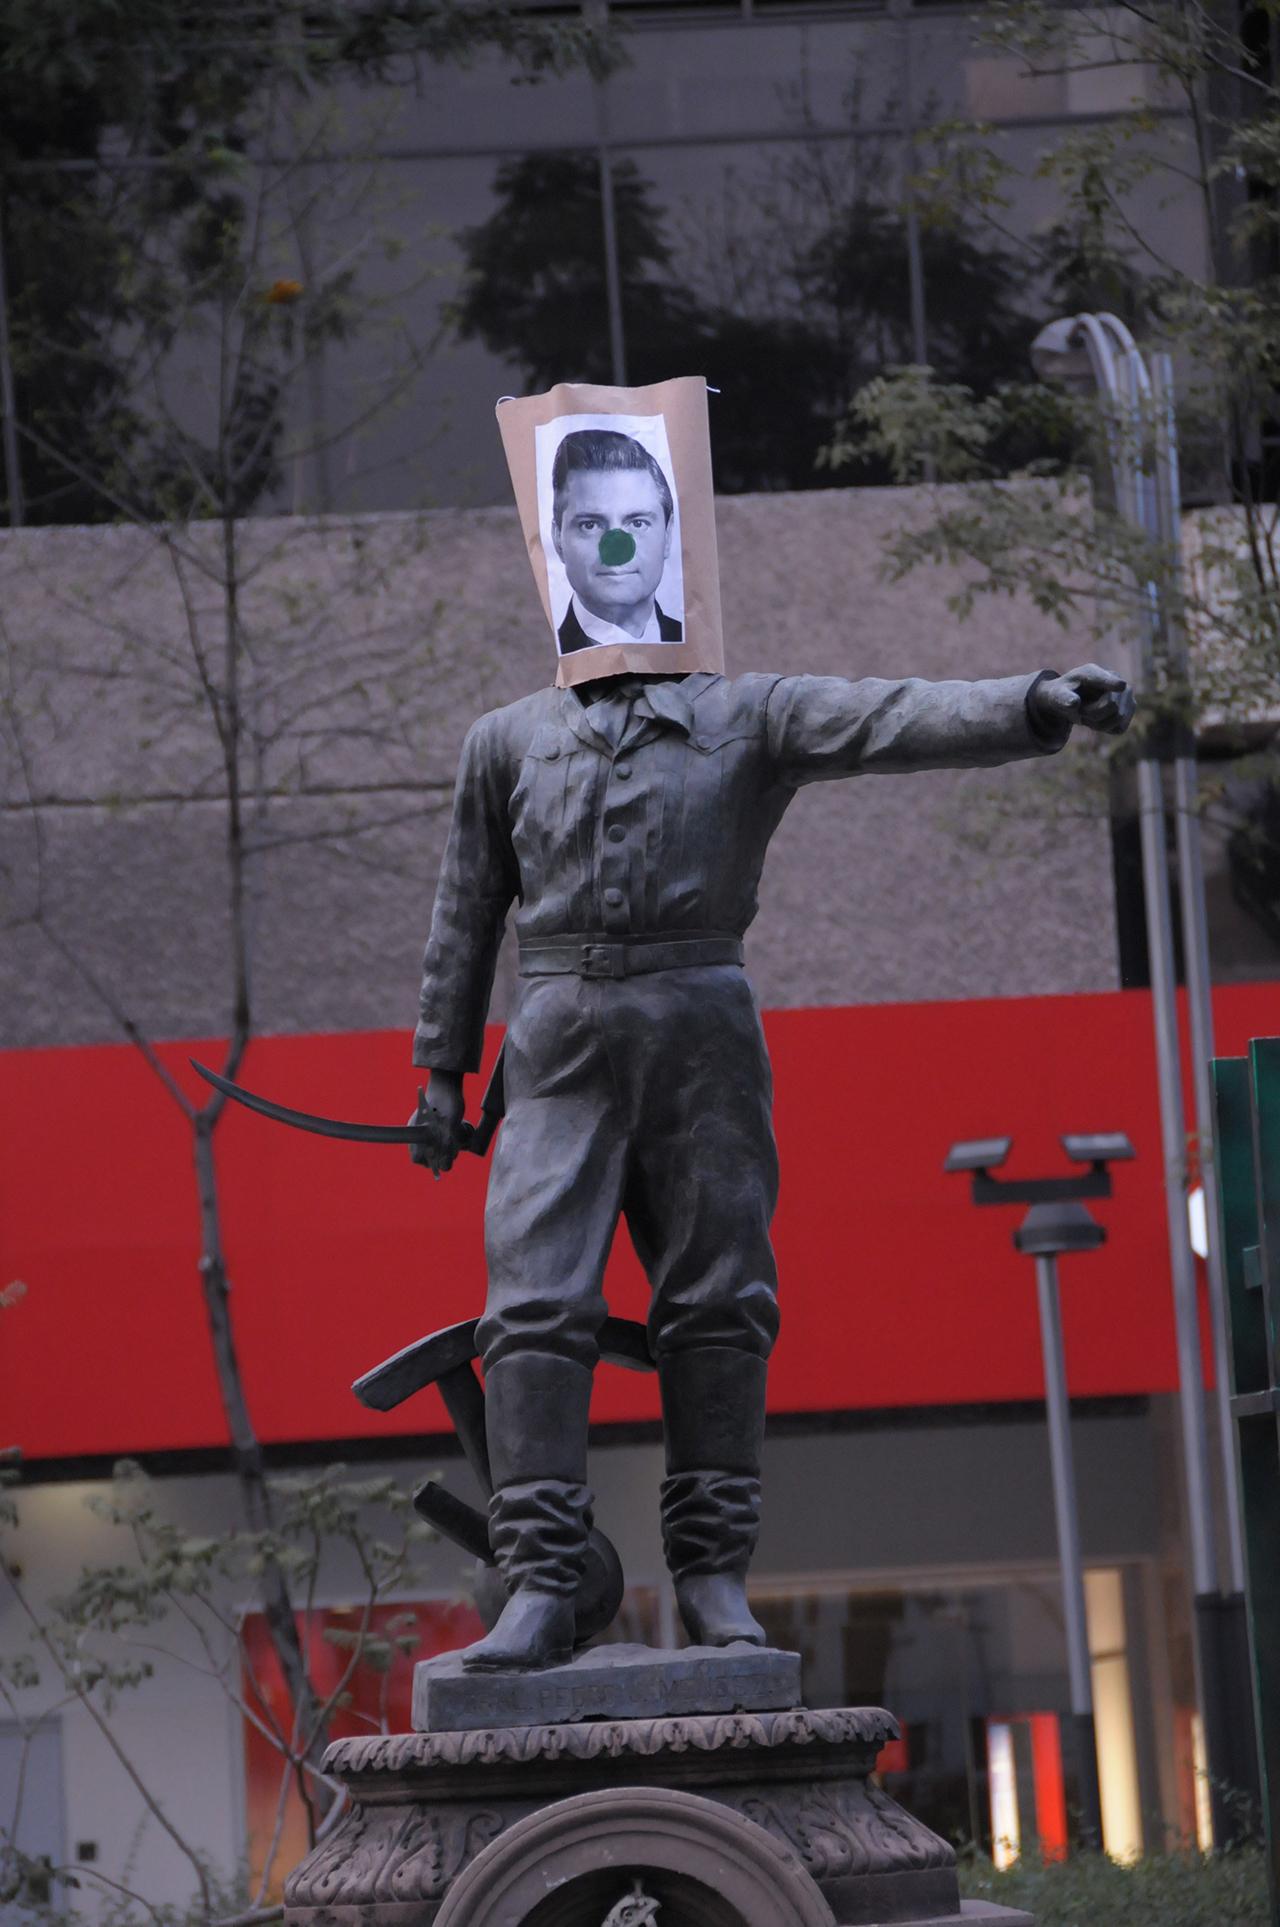 A sculpture along Reforma avenue bearing President Enrique Peña Nieto's likeness with a clown nose (click to enlarge)